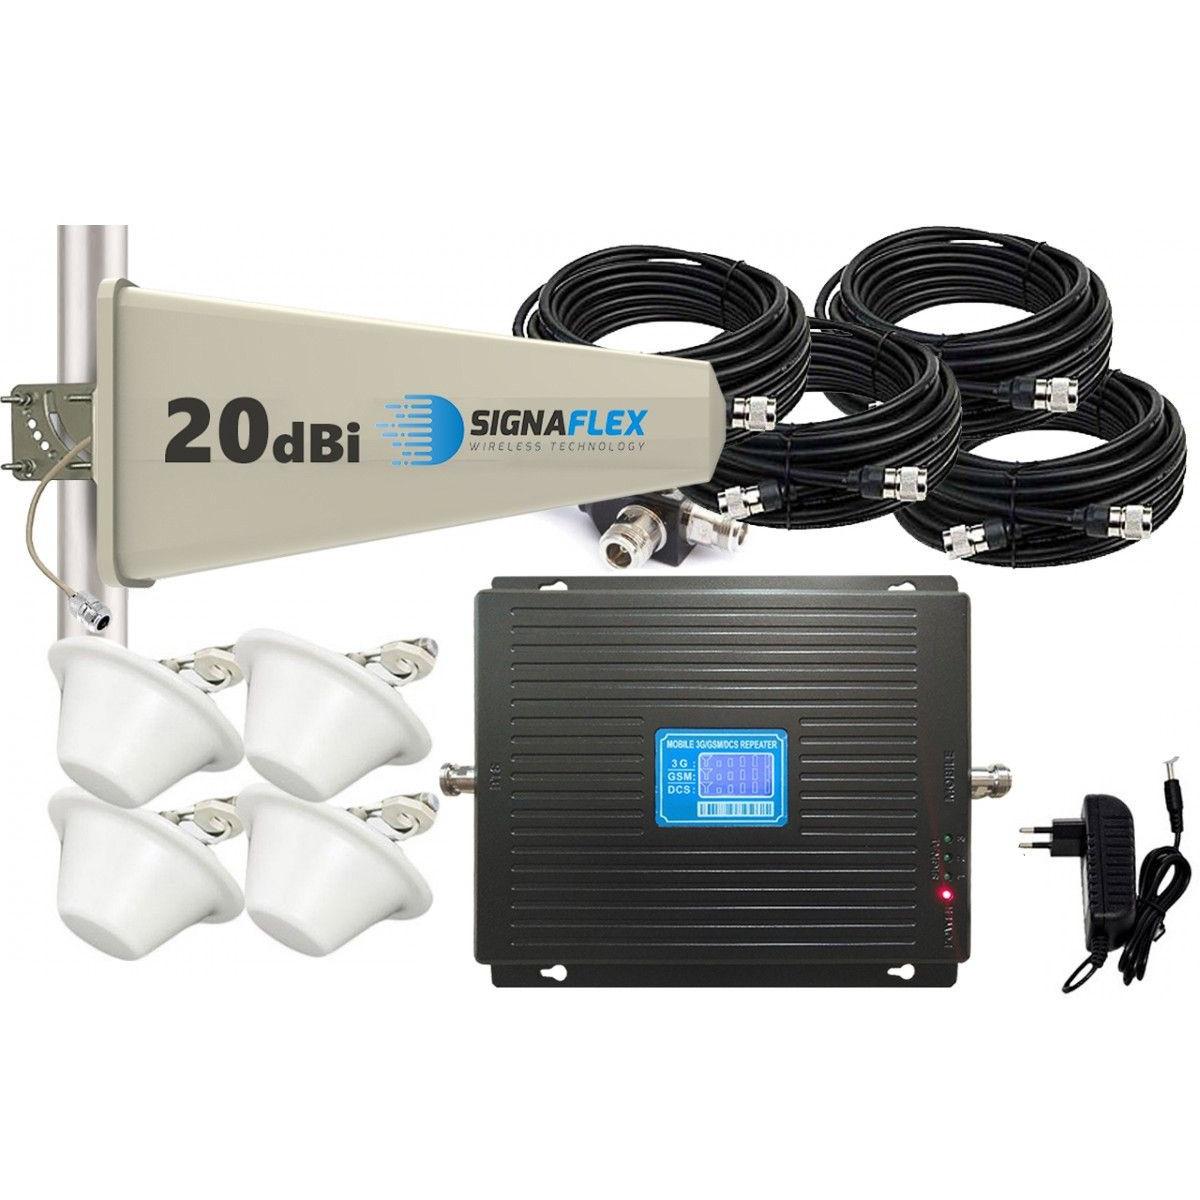 Komplet GSM/UMTS/DCS Black LCD Tajfun 4x grzybek